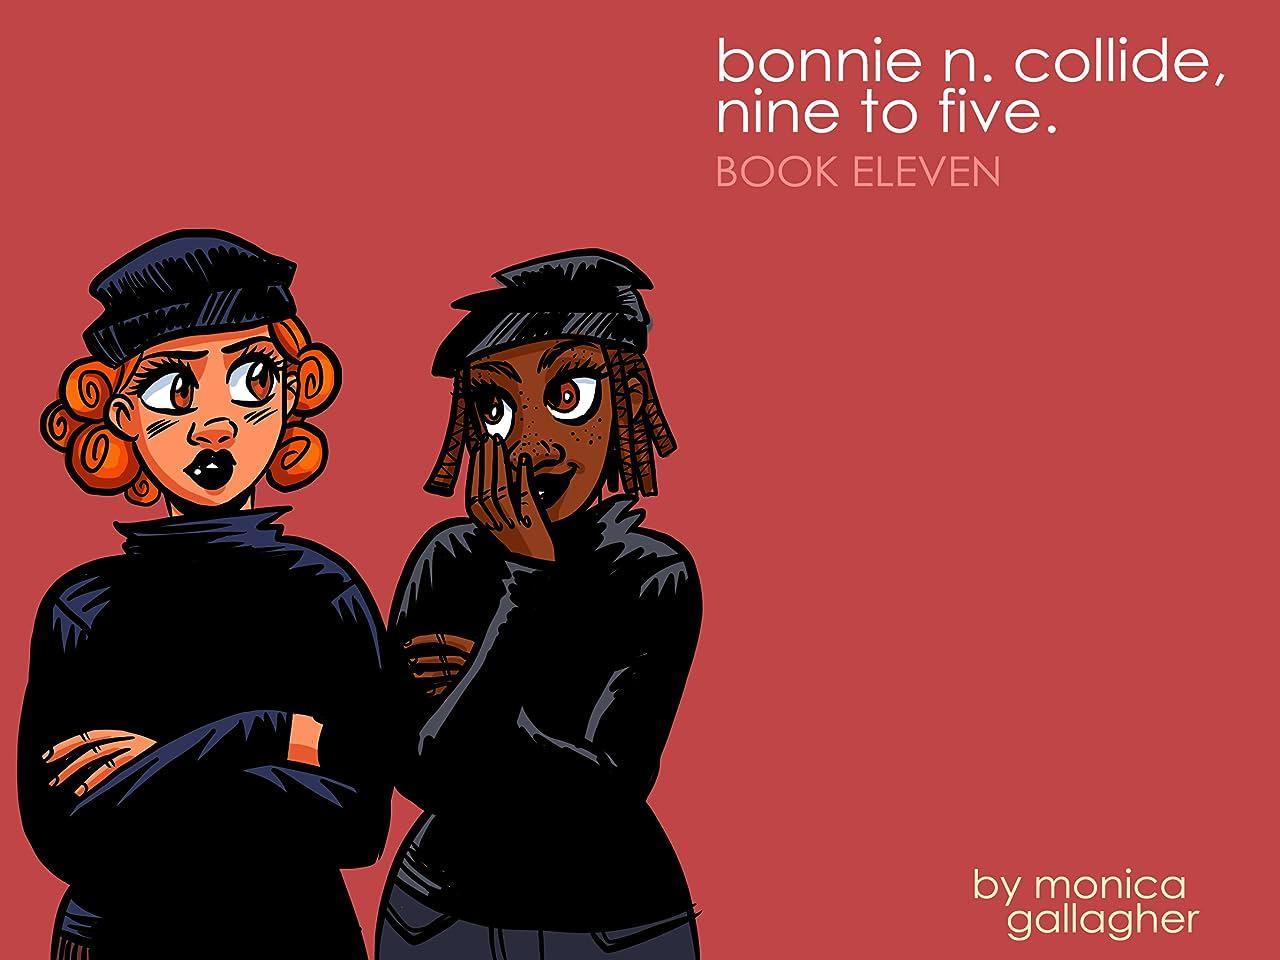 Bonnie N. Collide, Nine to Five No.11